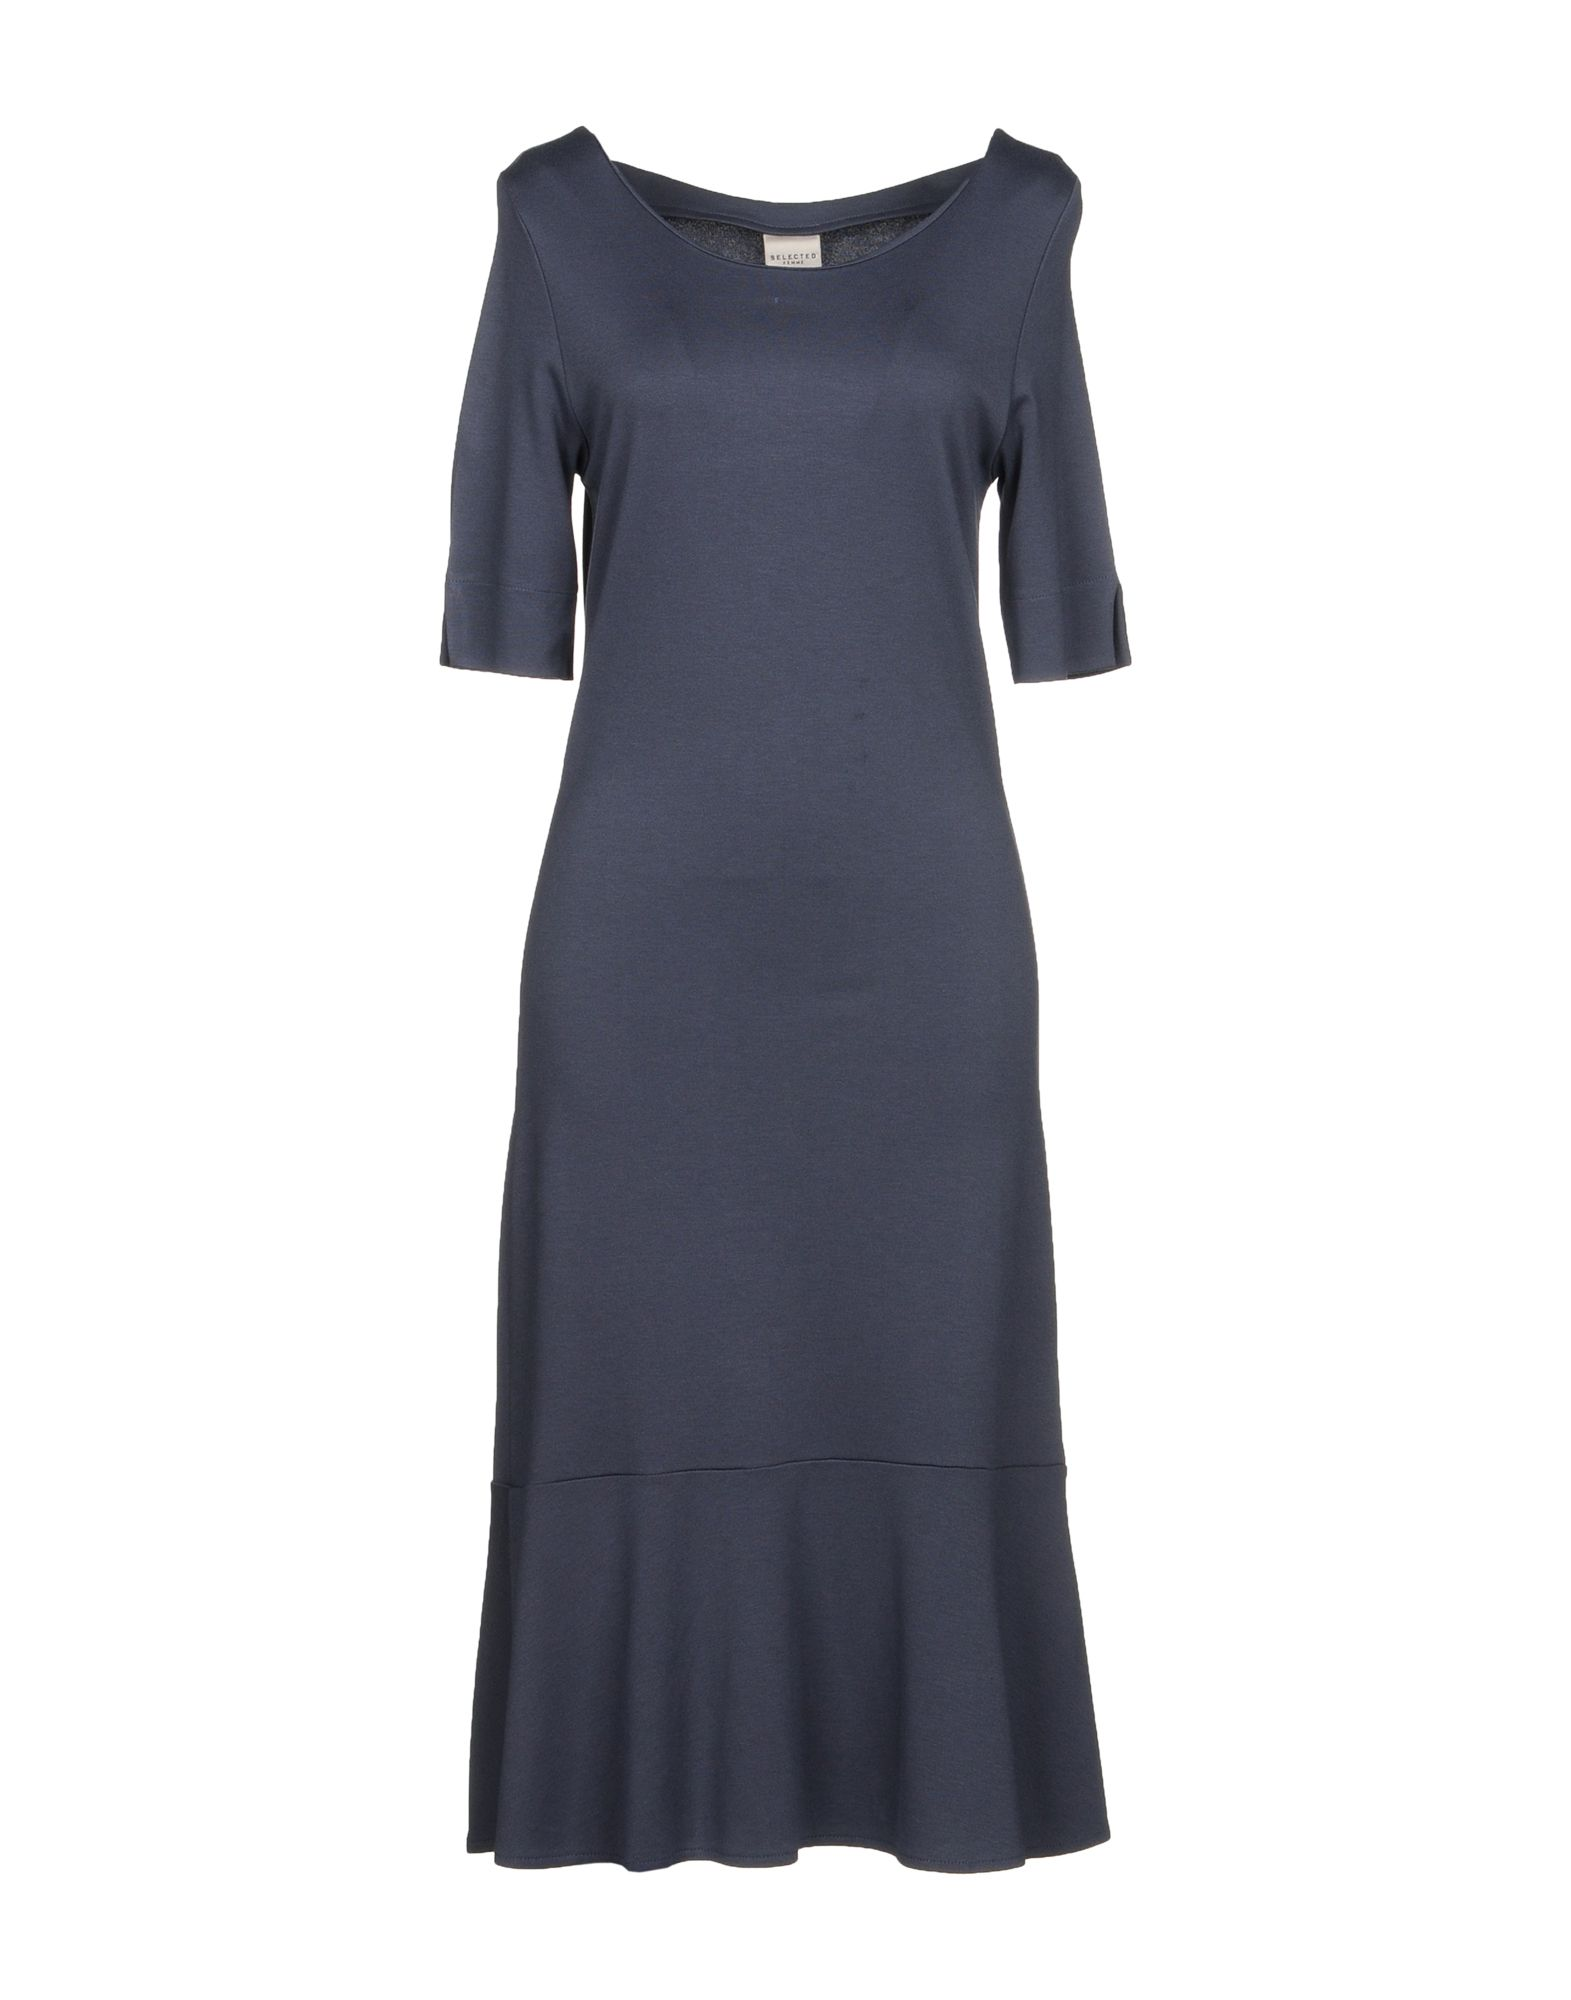 SELECTED FEMME Платье до колена femme платье